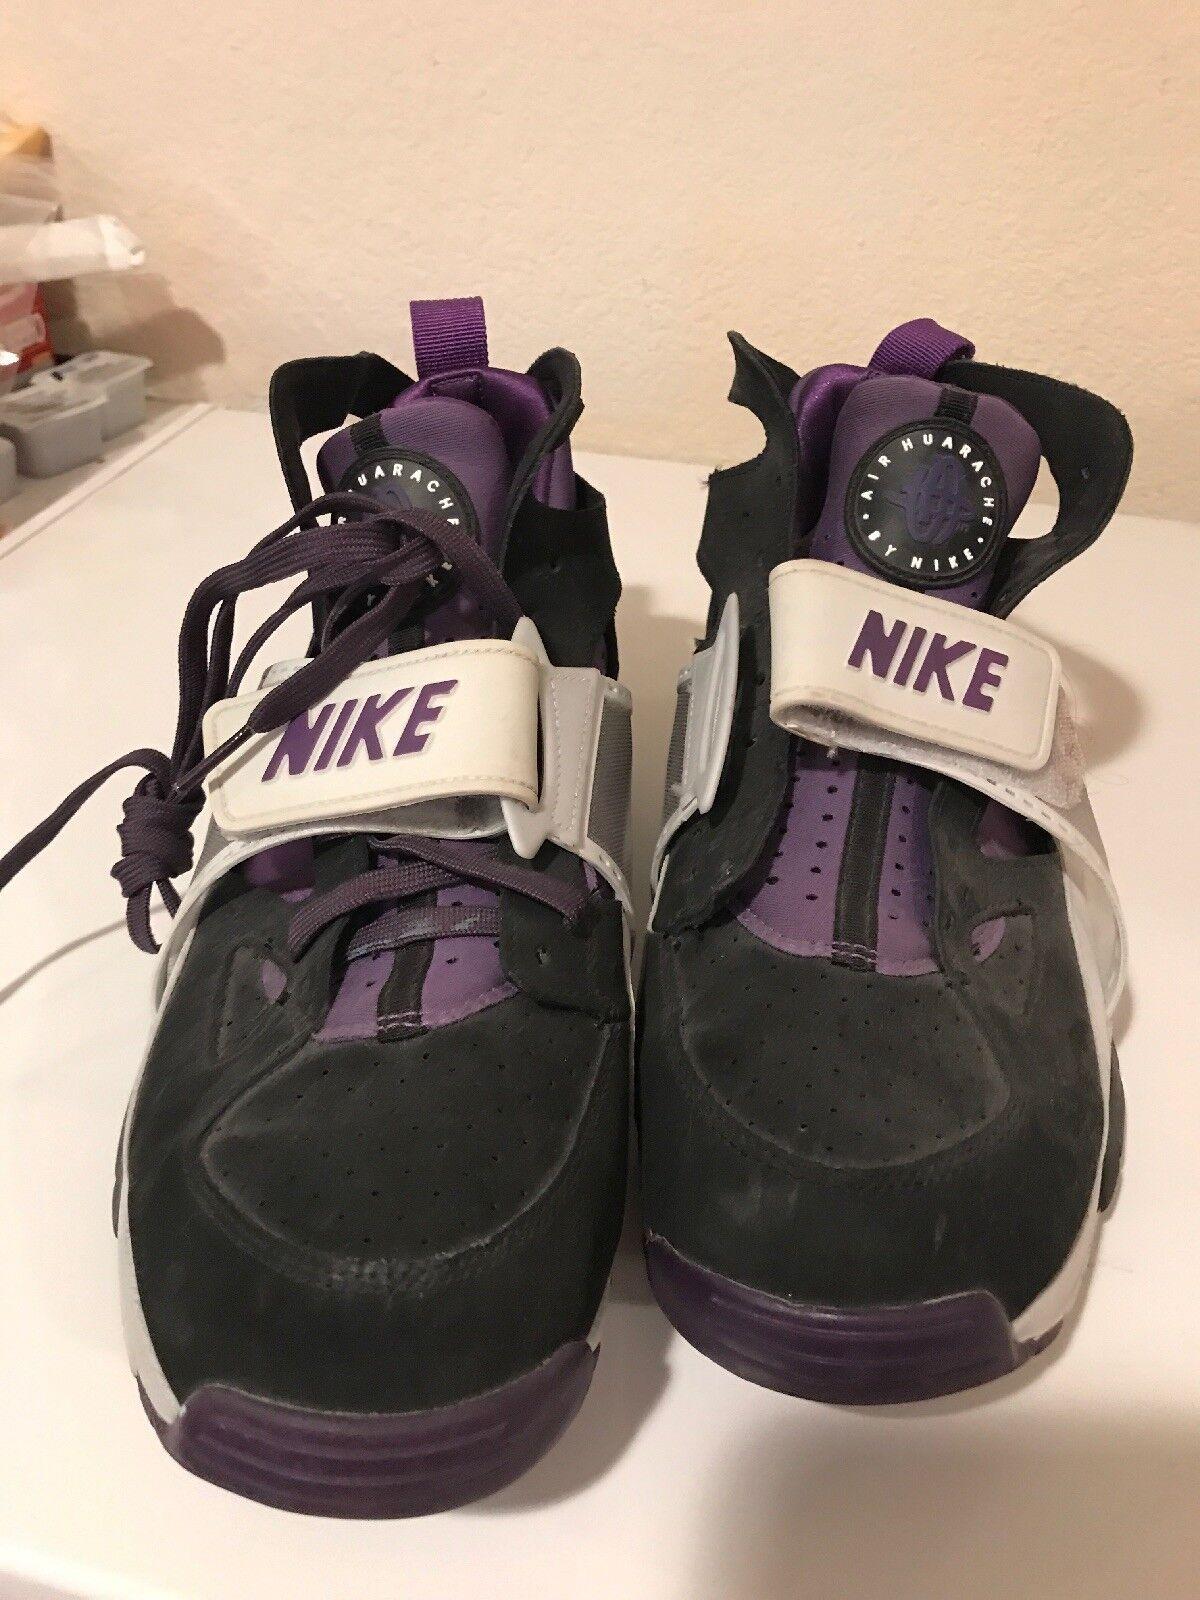 Nike Nike Nike Air Trainer Huarache Purple Black Ice Mens size 10 5f8584